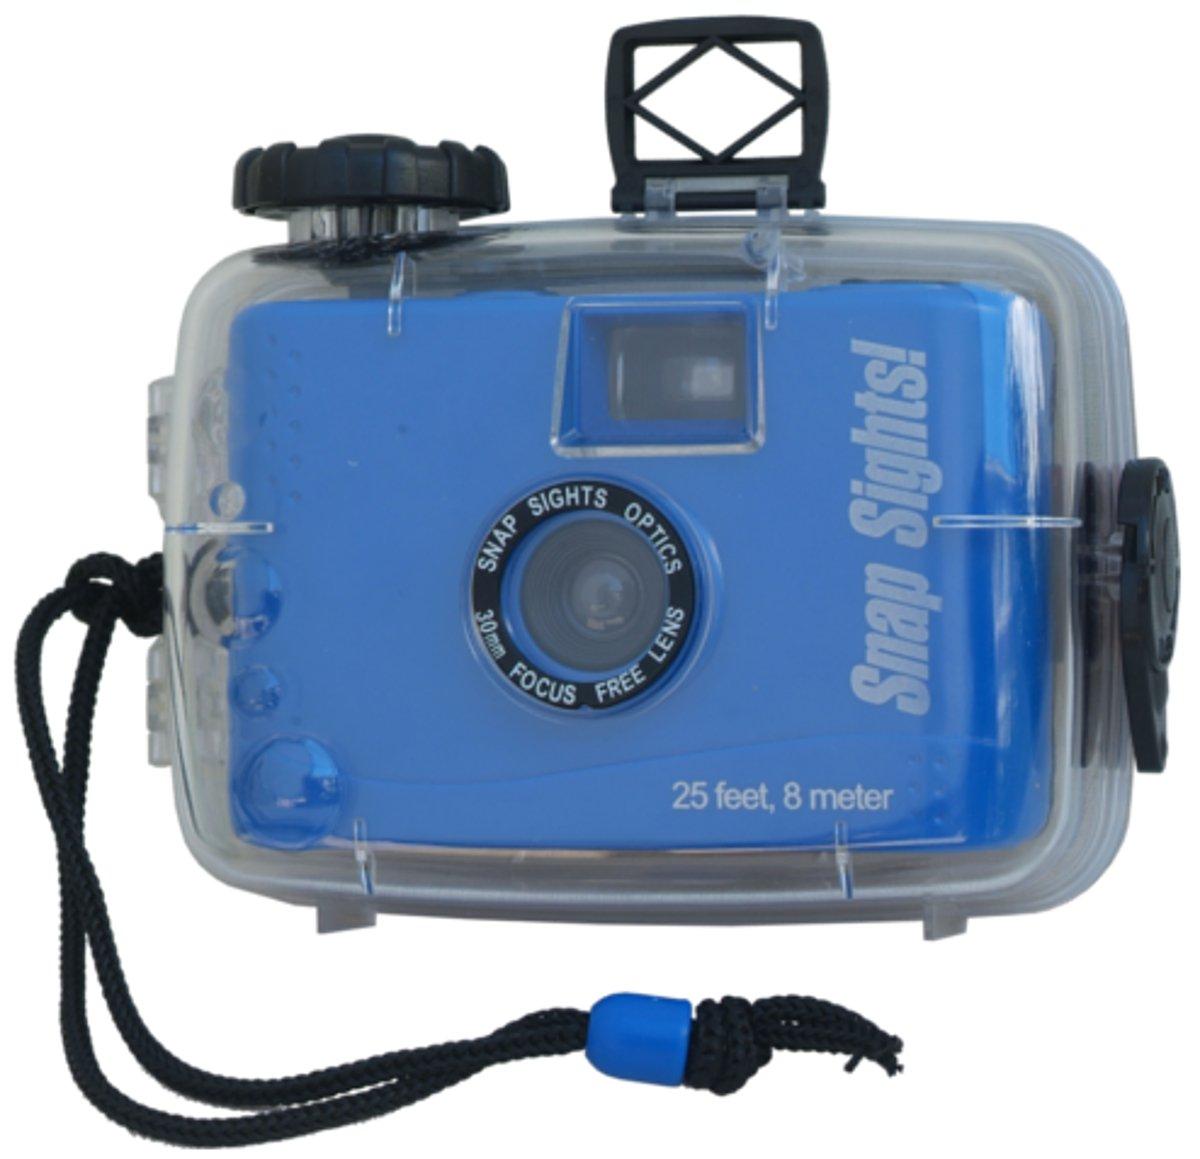 SNKL U//W CAMERA BLUE 25 FT Innovative Scuba Concepts PH0325